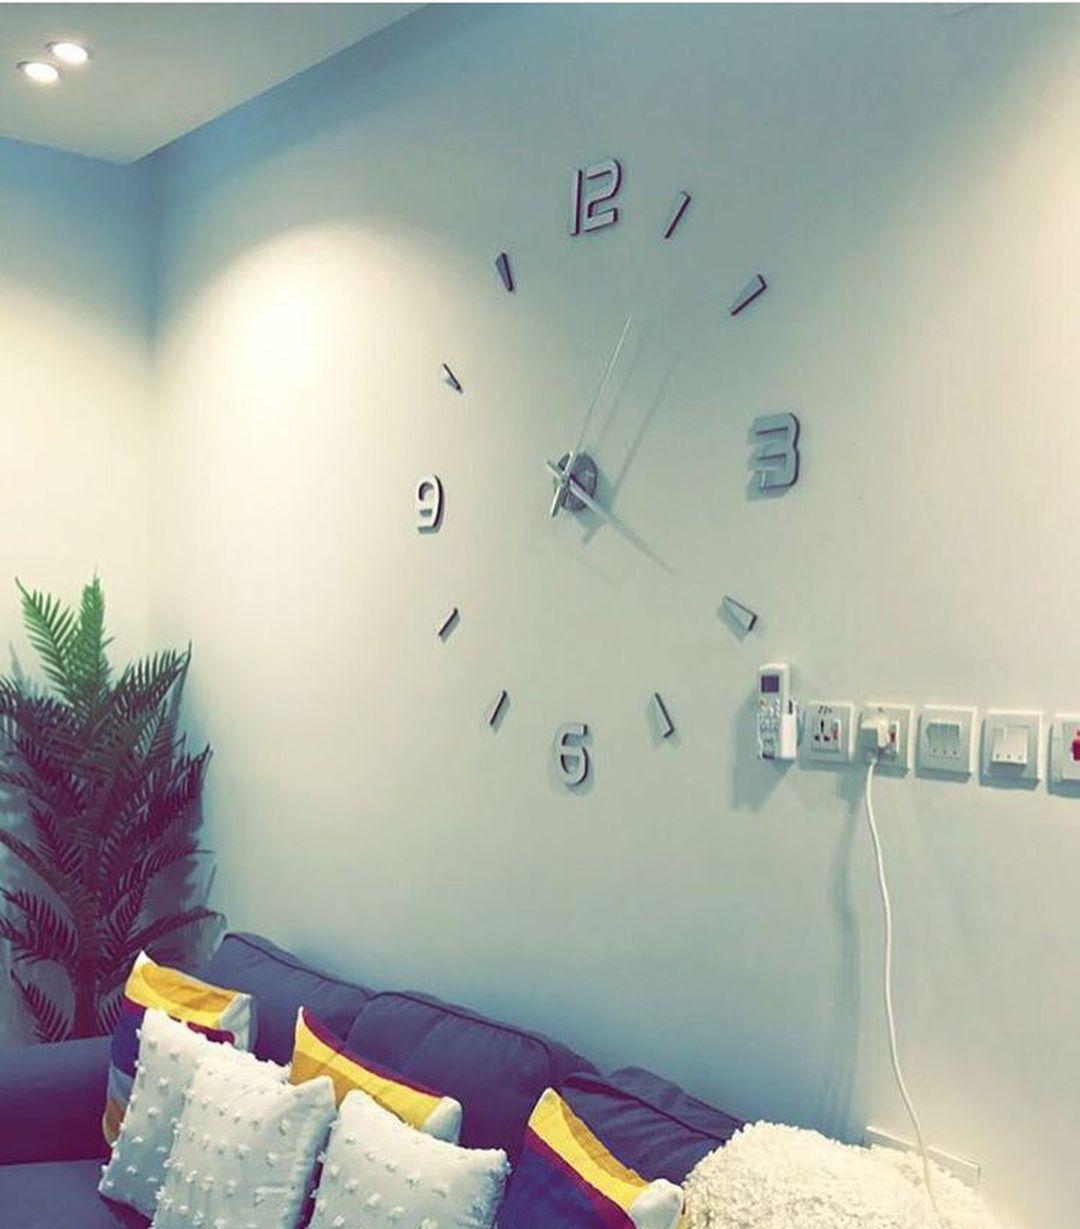 067d13b97 wall_hour . متجر وجدان ساعات حائط 3D @wall_hour . @wall_hour ...